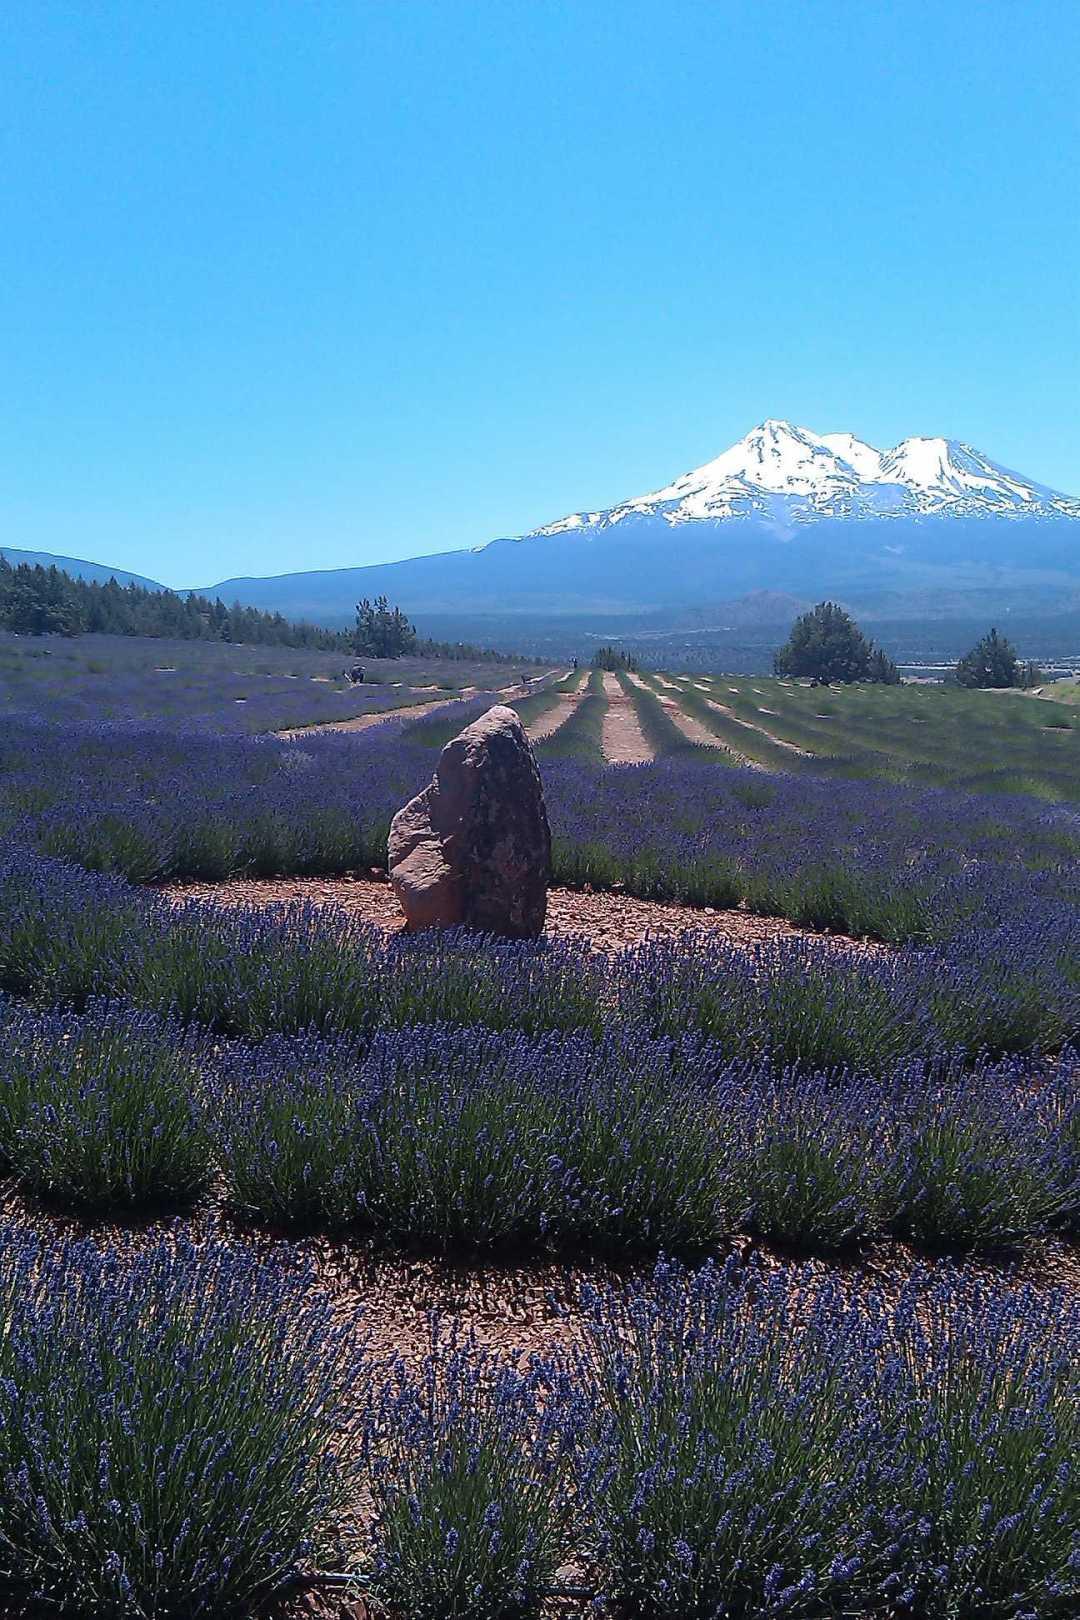 Mount Shasta Lavender Farm, JHD